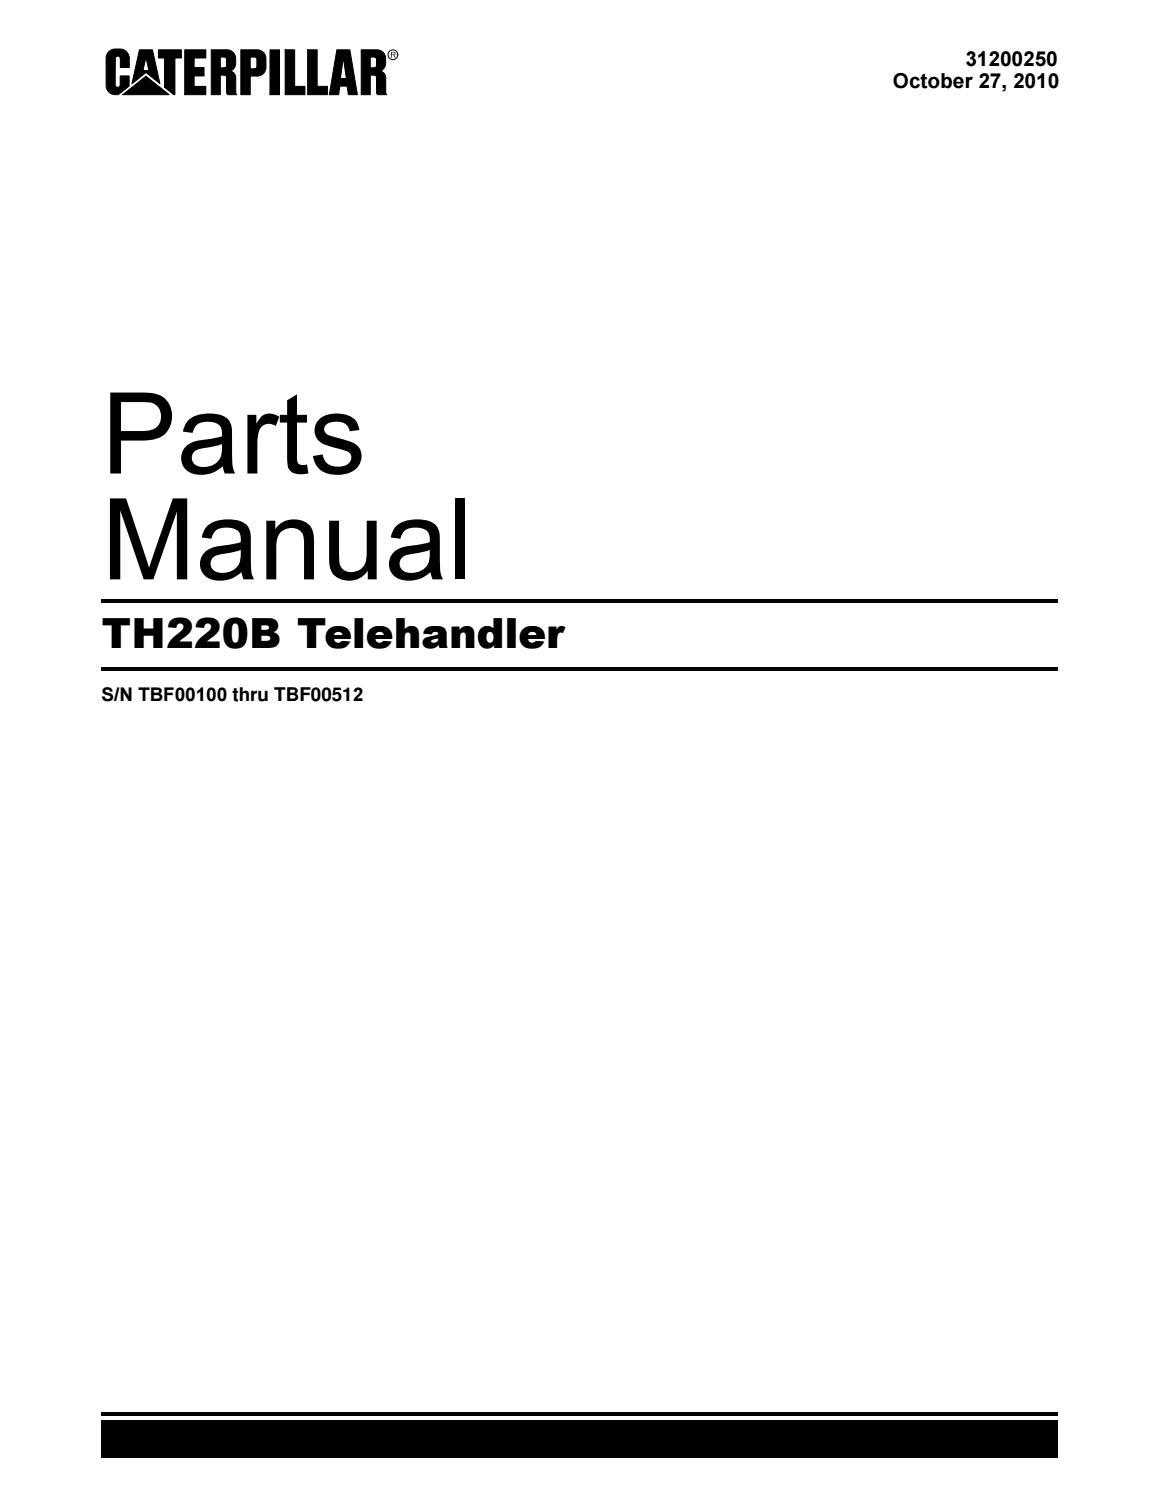 Parts Manual CAT TH220B Telehandler S/N TBF00100 thru TBF00512 #1 by  Ahmadfikry Work - issuuIssuu